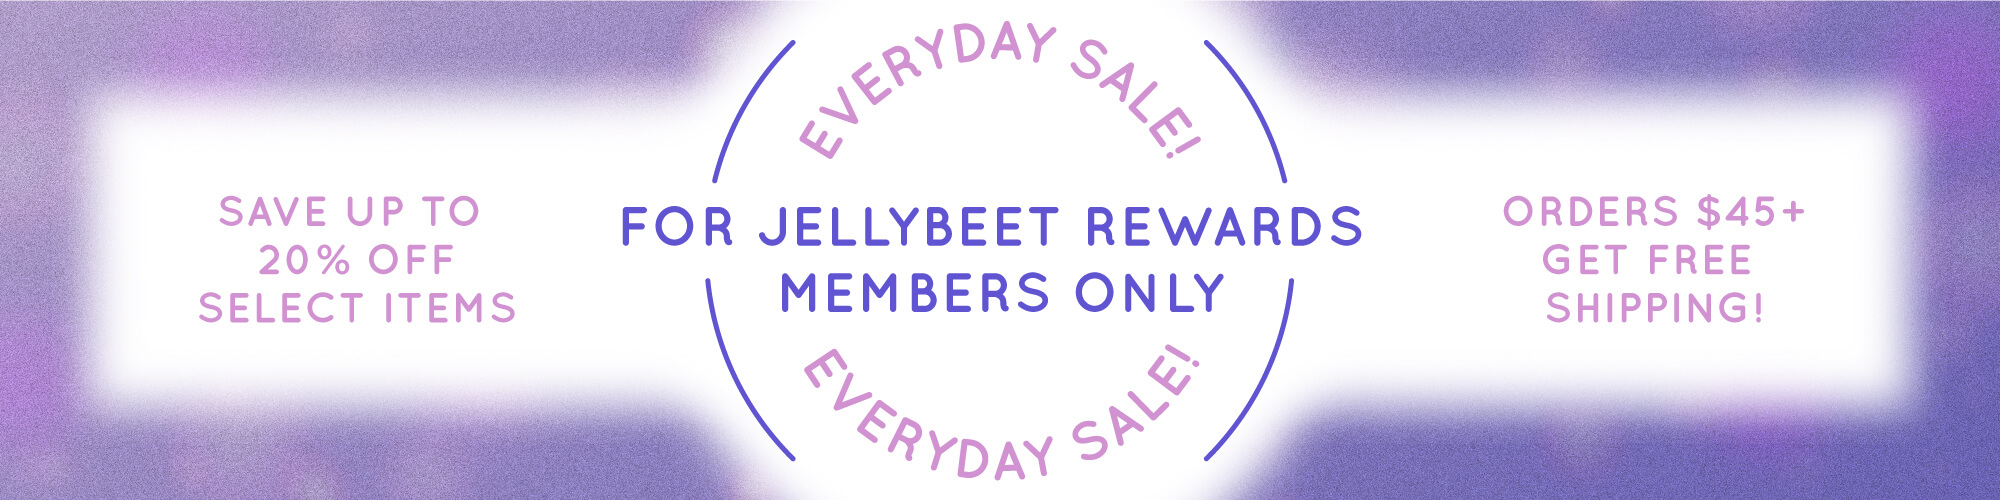 everydaysale-banner-1-2.jpg